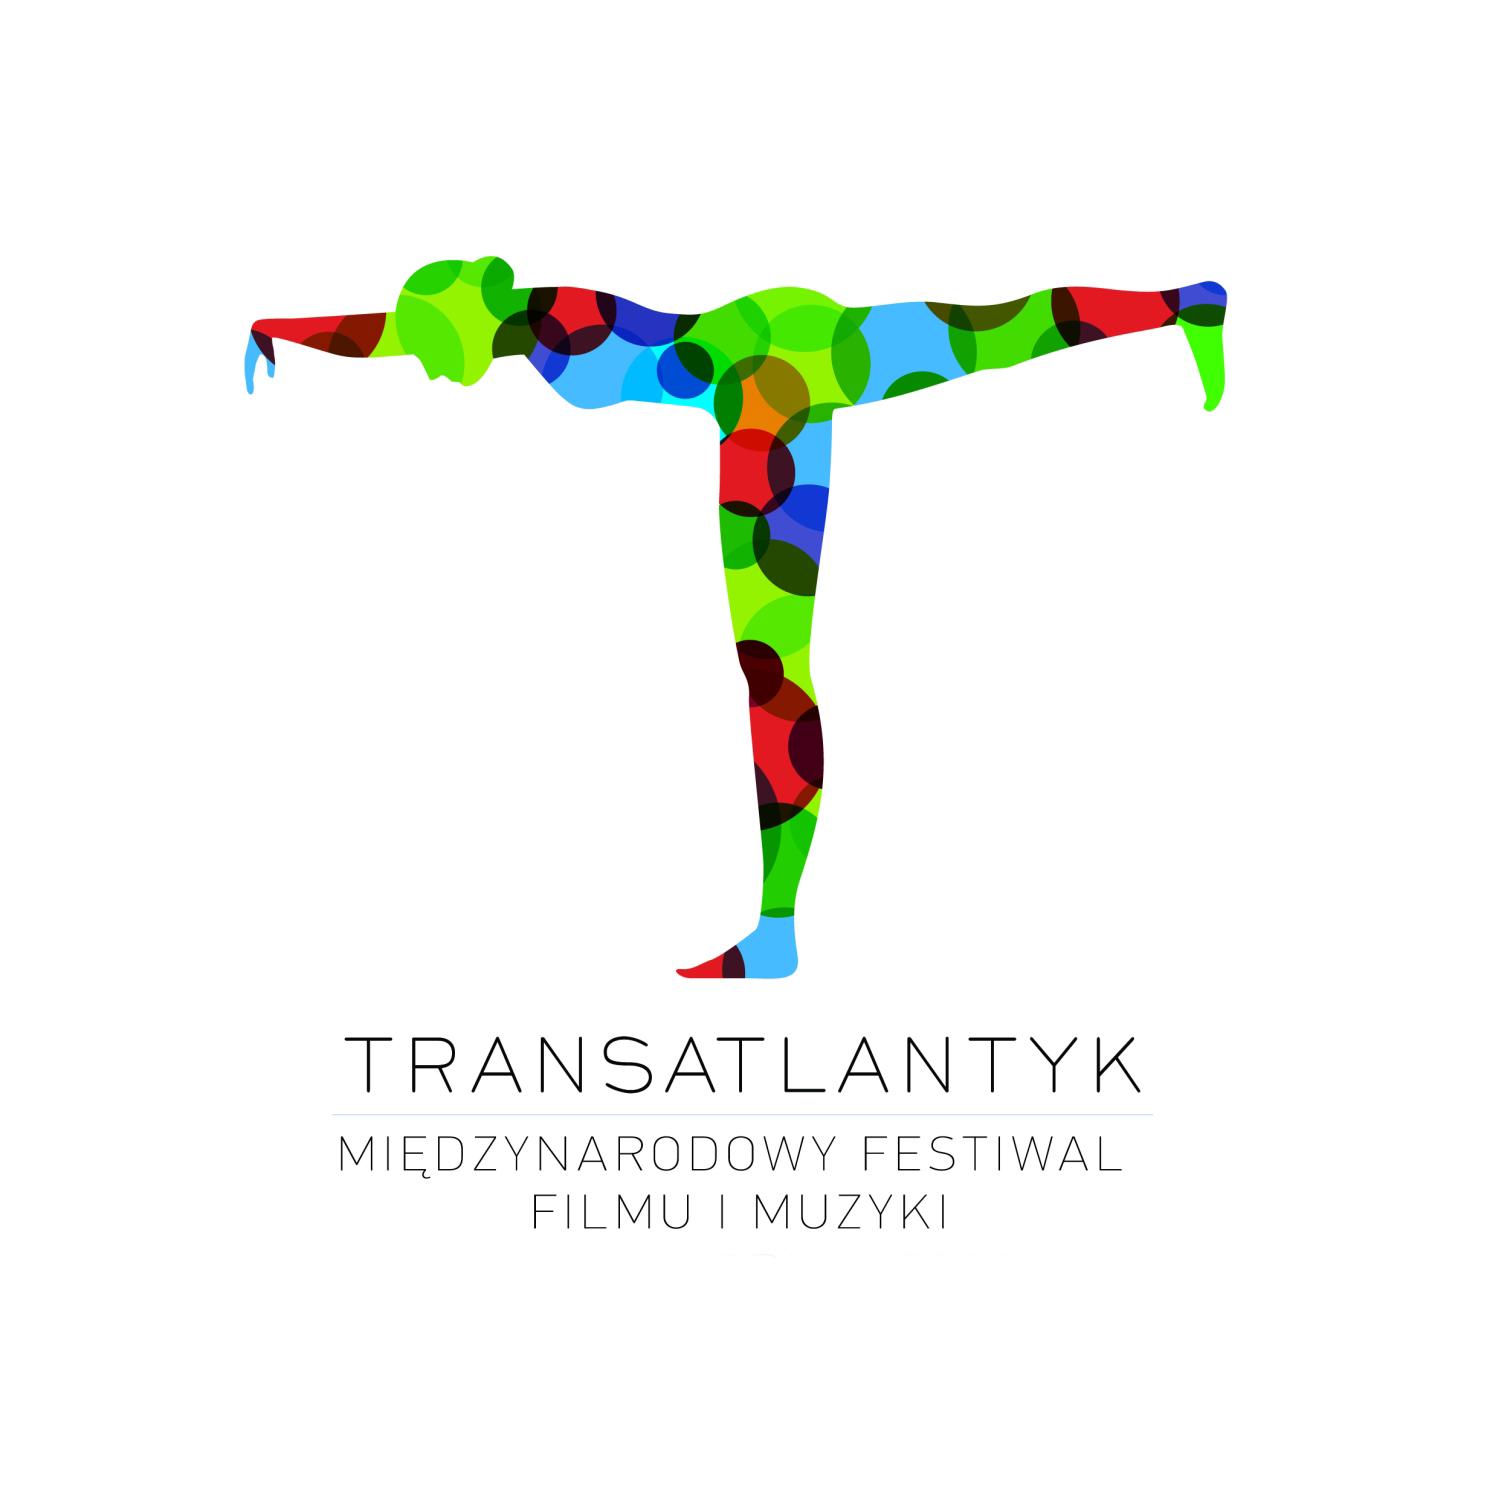 transatlantyk logo